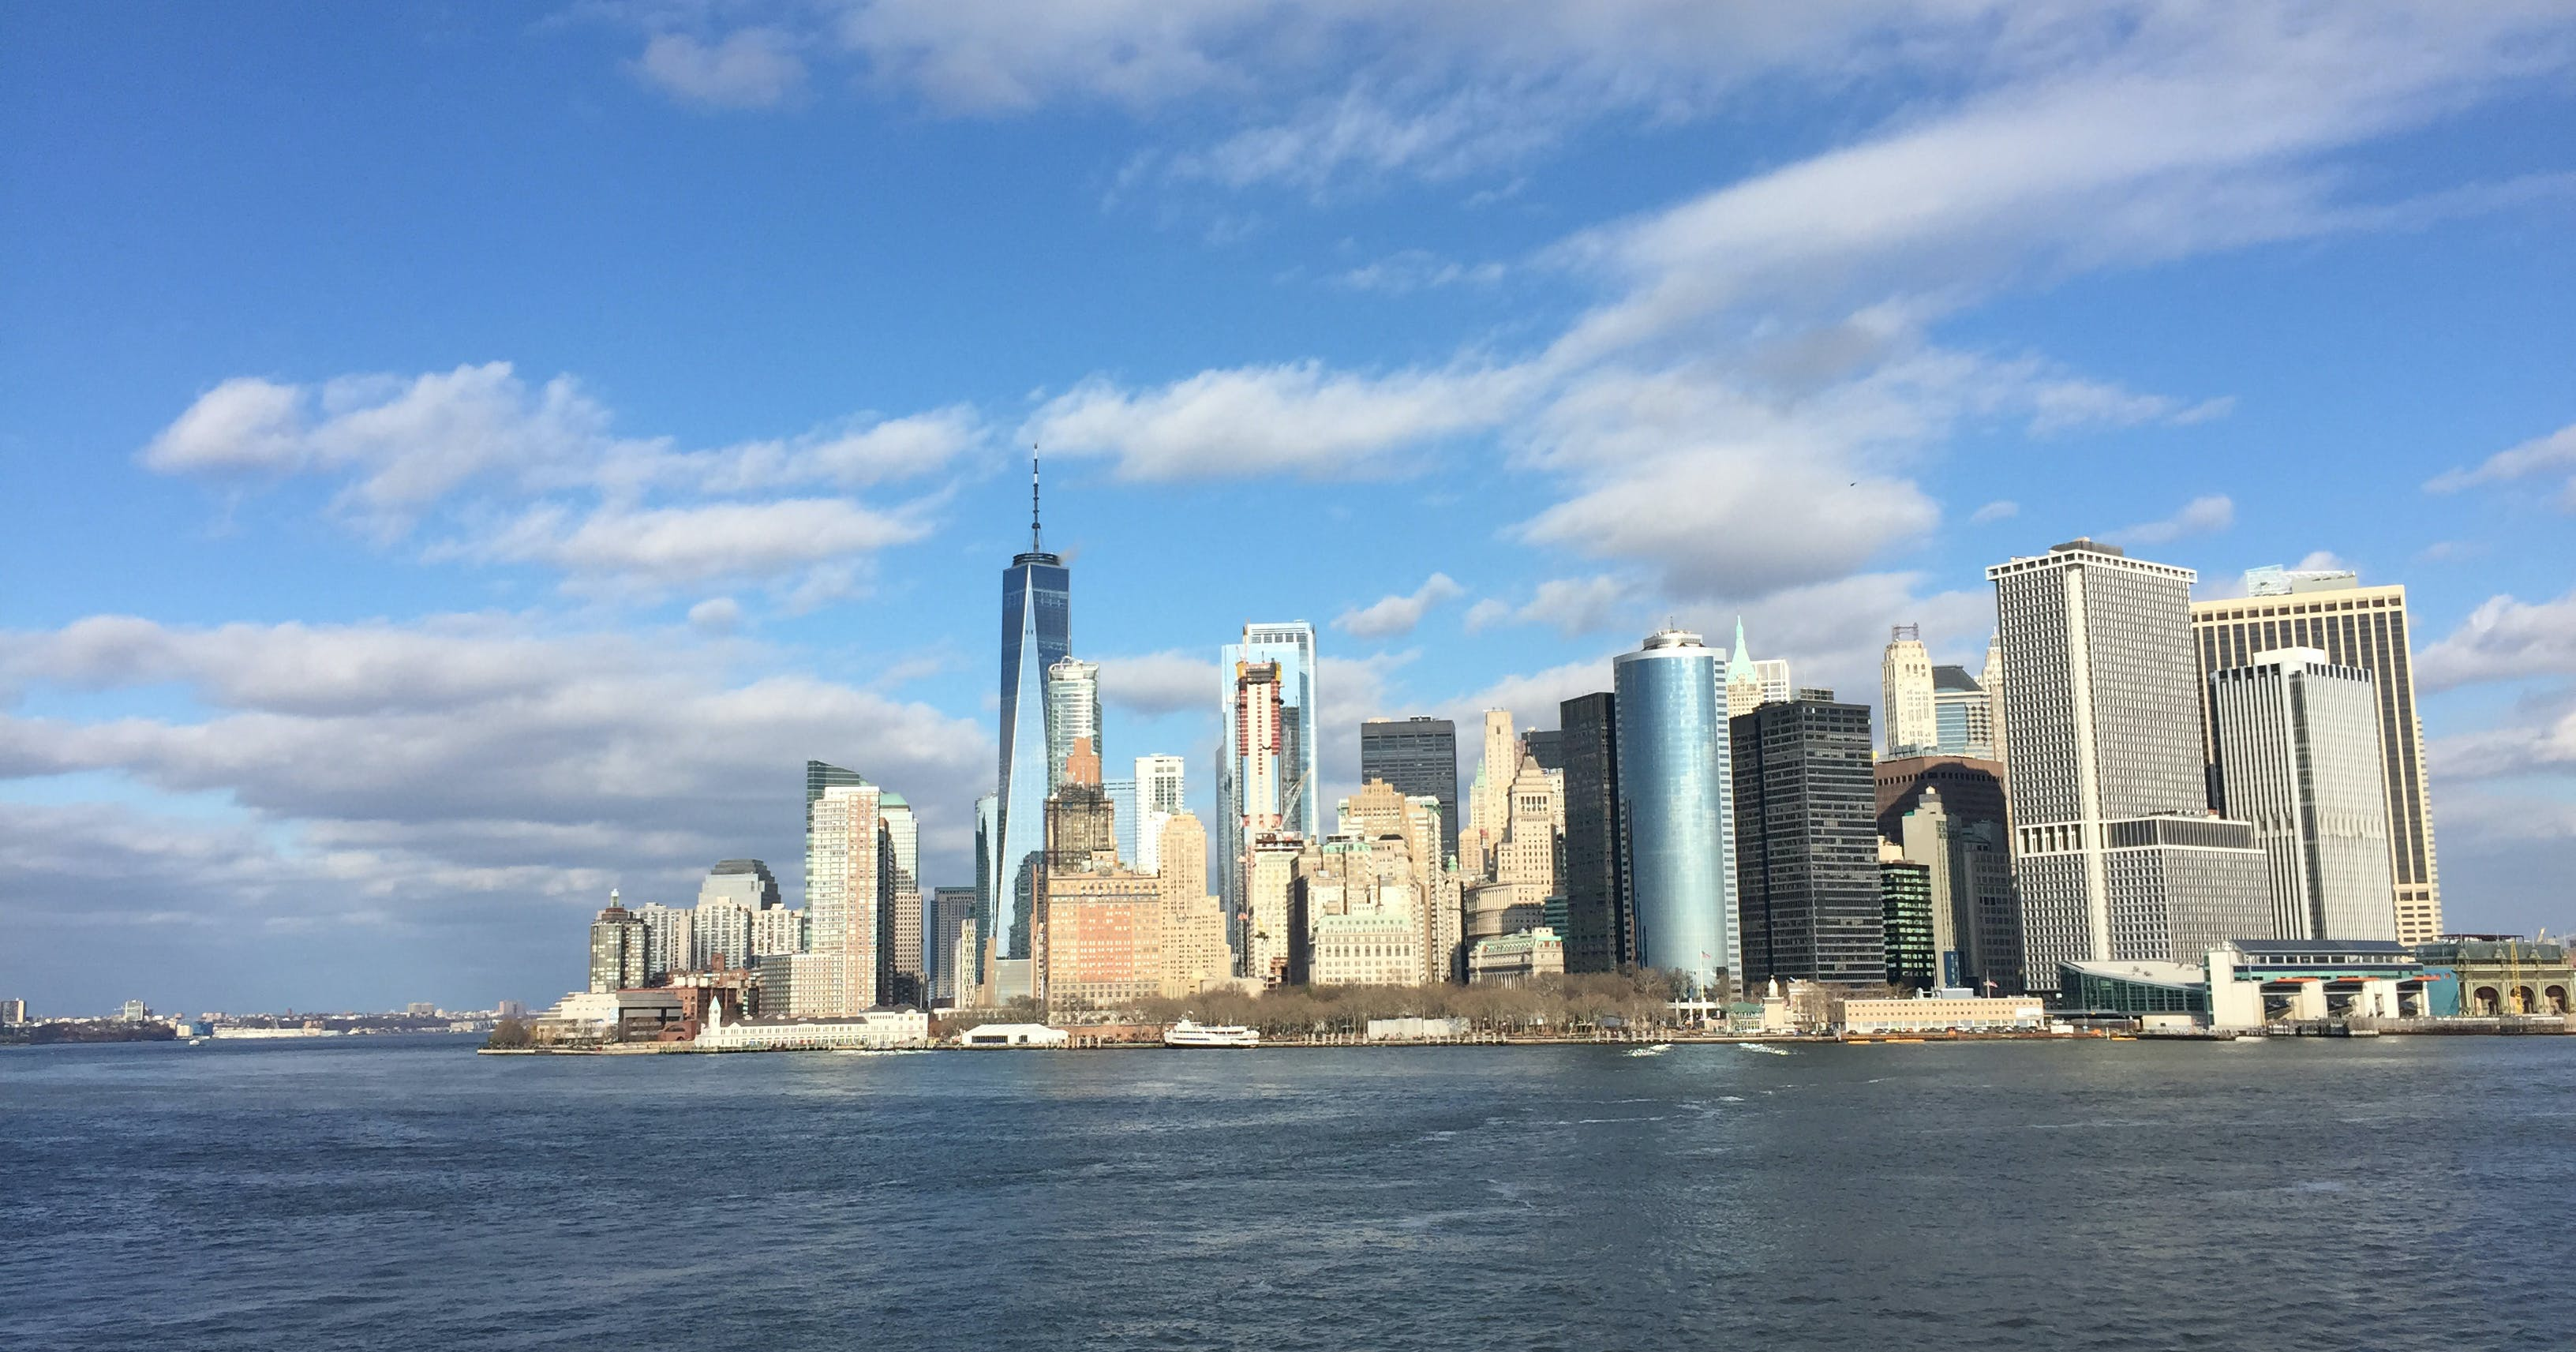 Free stock photo of cities, skyline